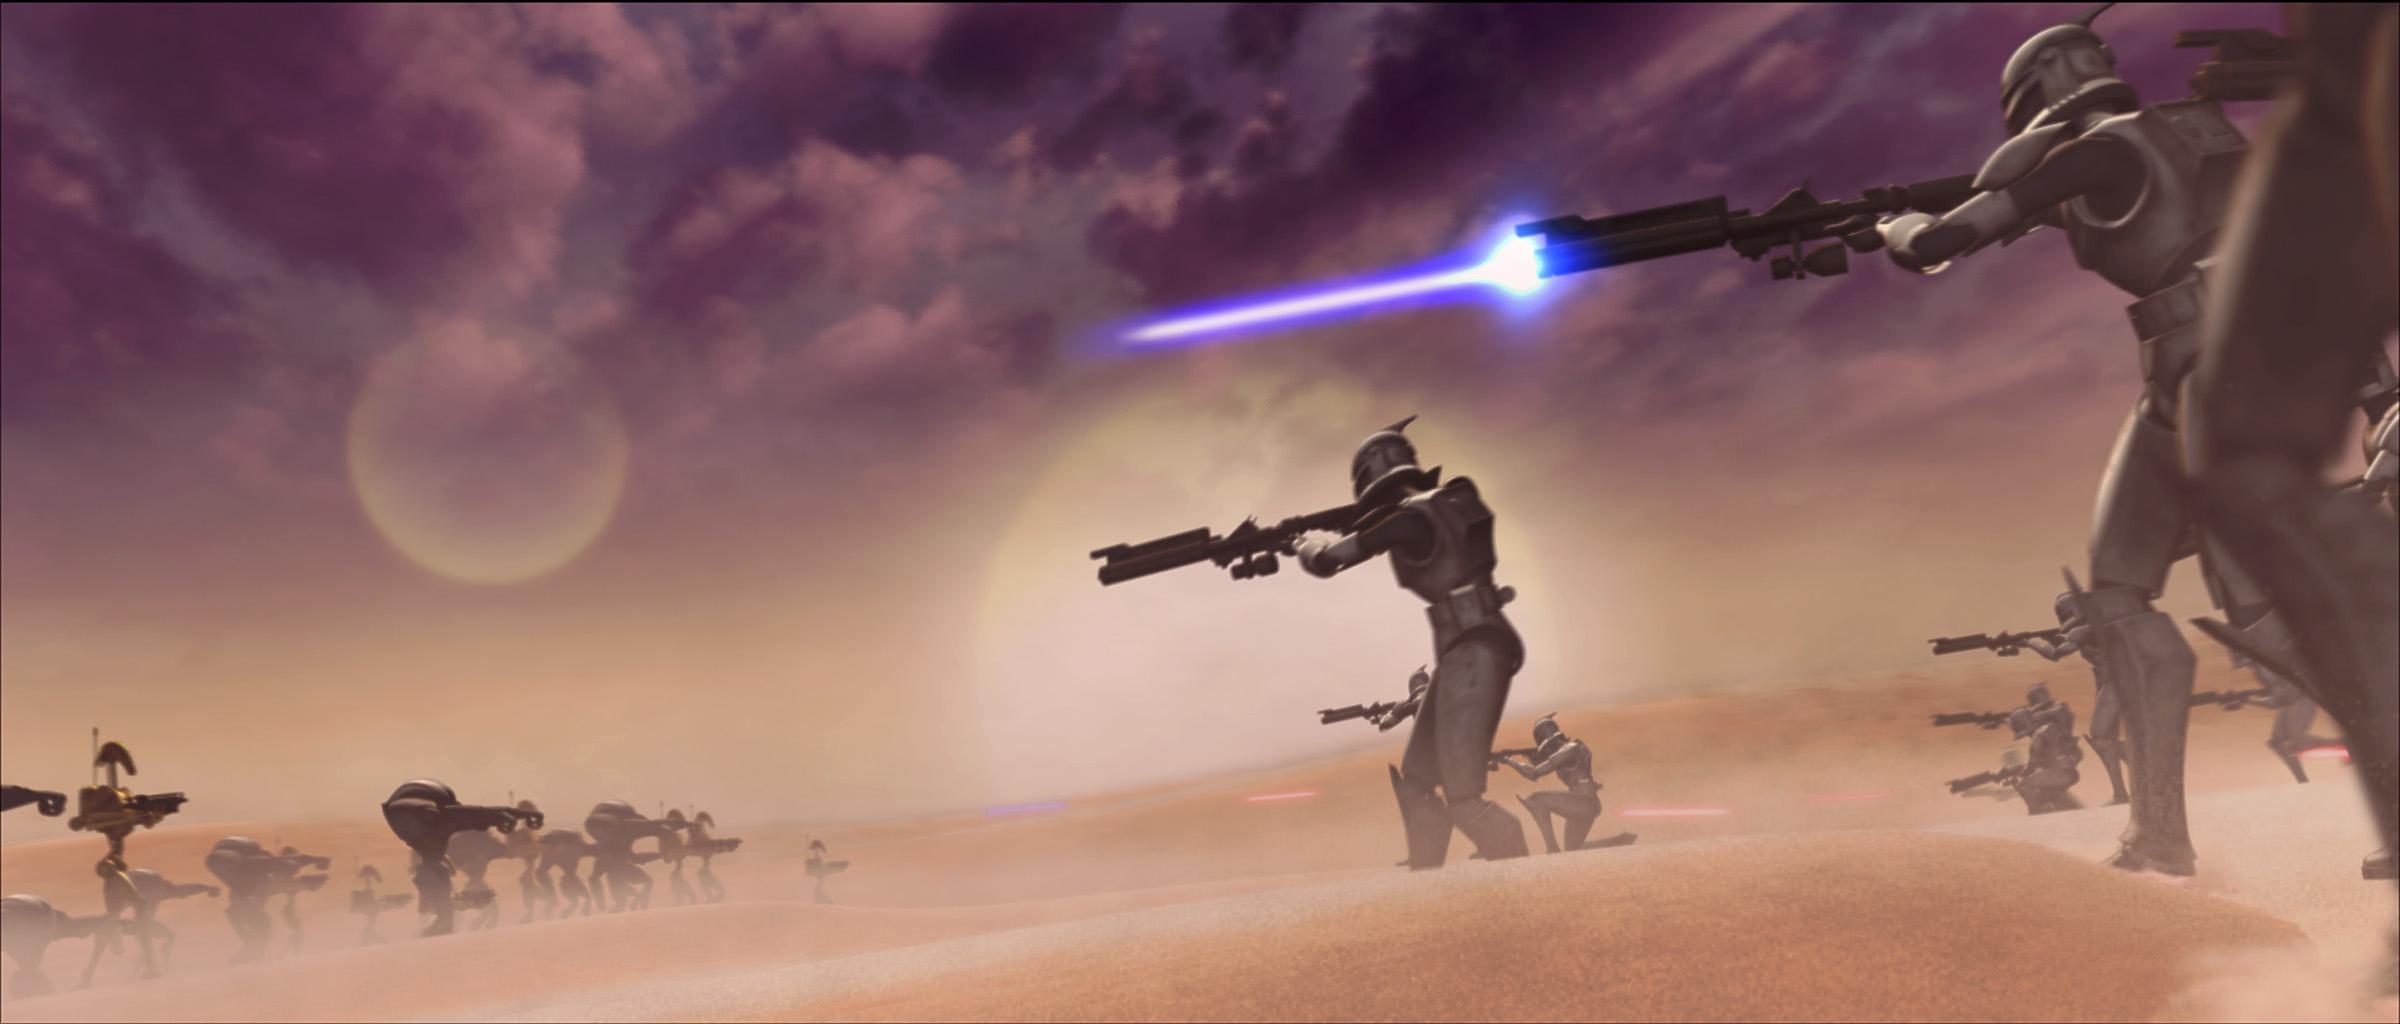 Star Wars Clone Wars Battle Wallpaper   Viewing Gallery 2400x1024